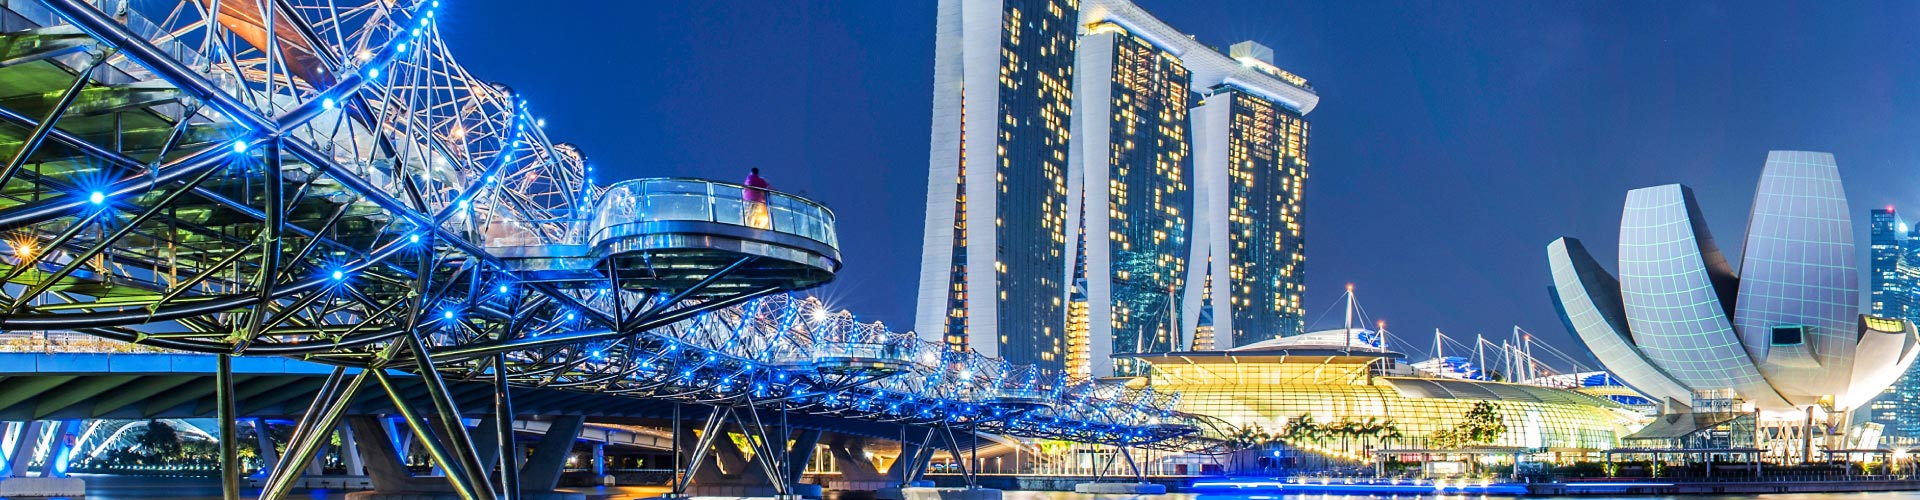 Getaway Cruise Wed & Fri Departure (Dream Cruise)